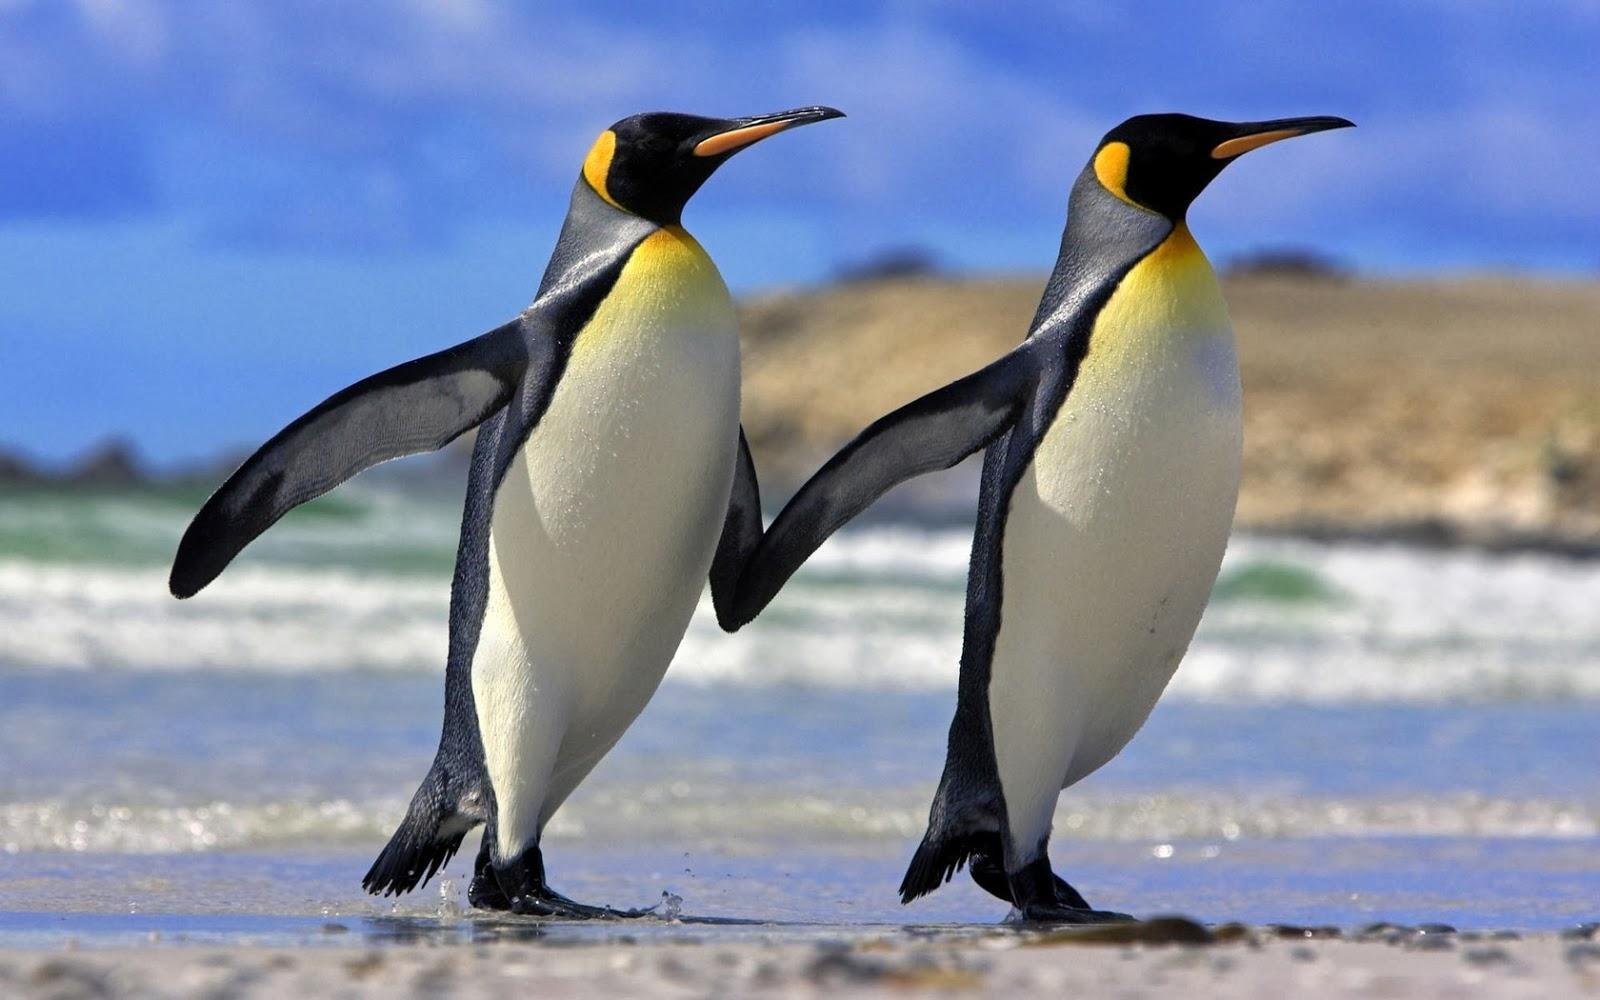 Animales, Salvajes Imágenes gratis en Pixabay